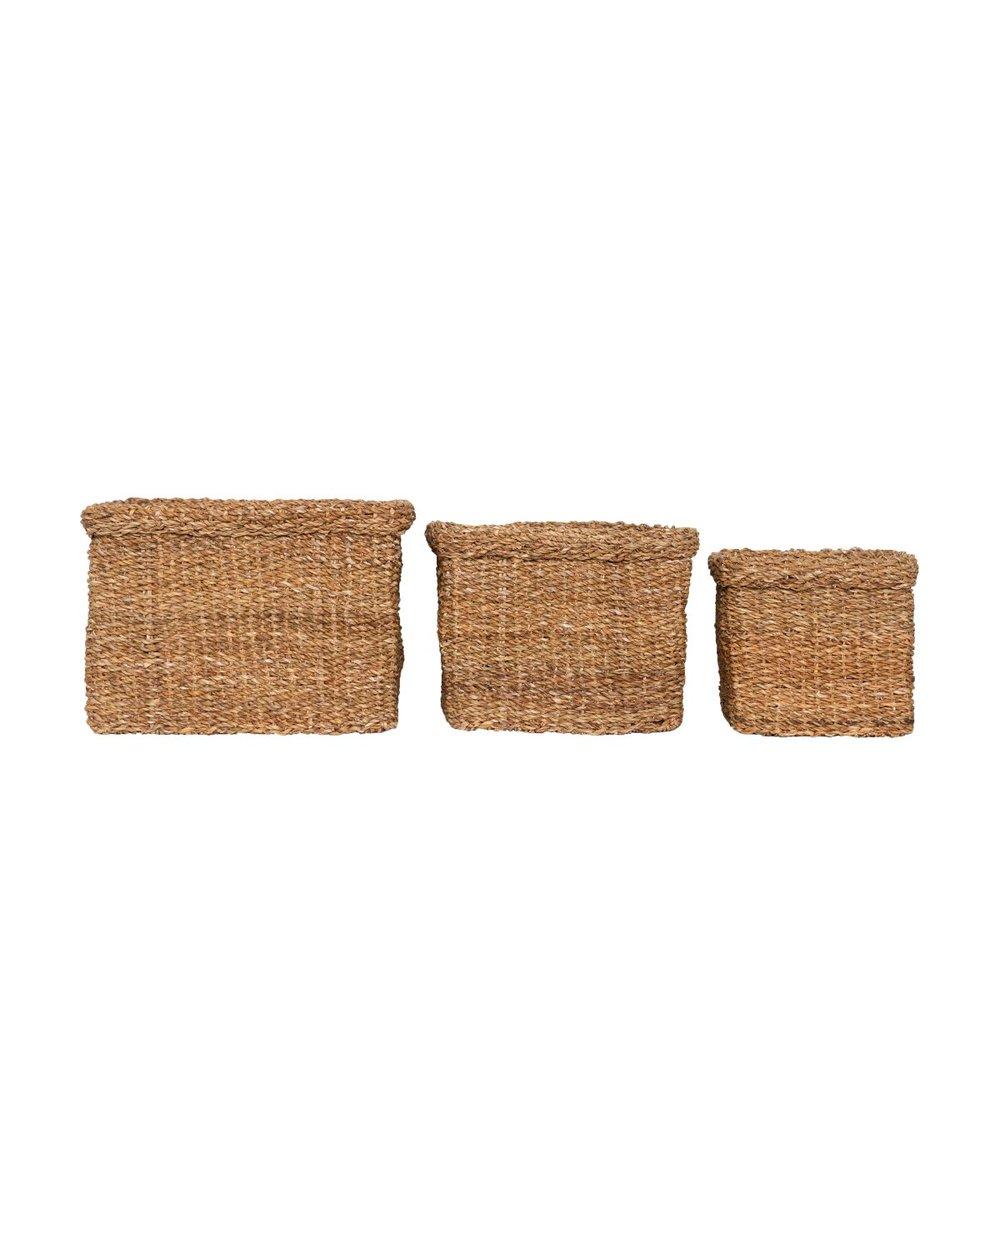 square_cuffed_seagrass_baskets4.jpg